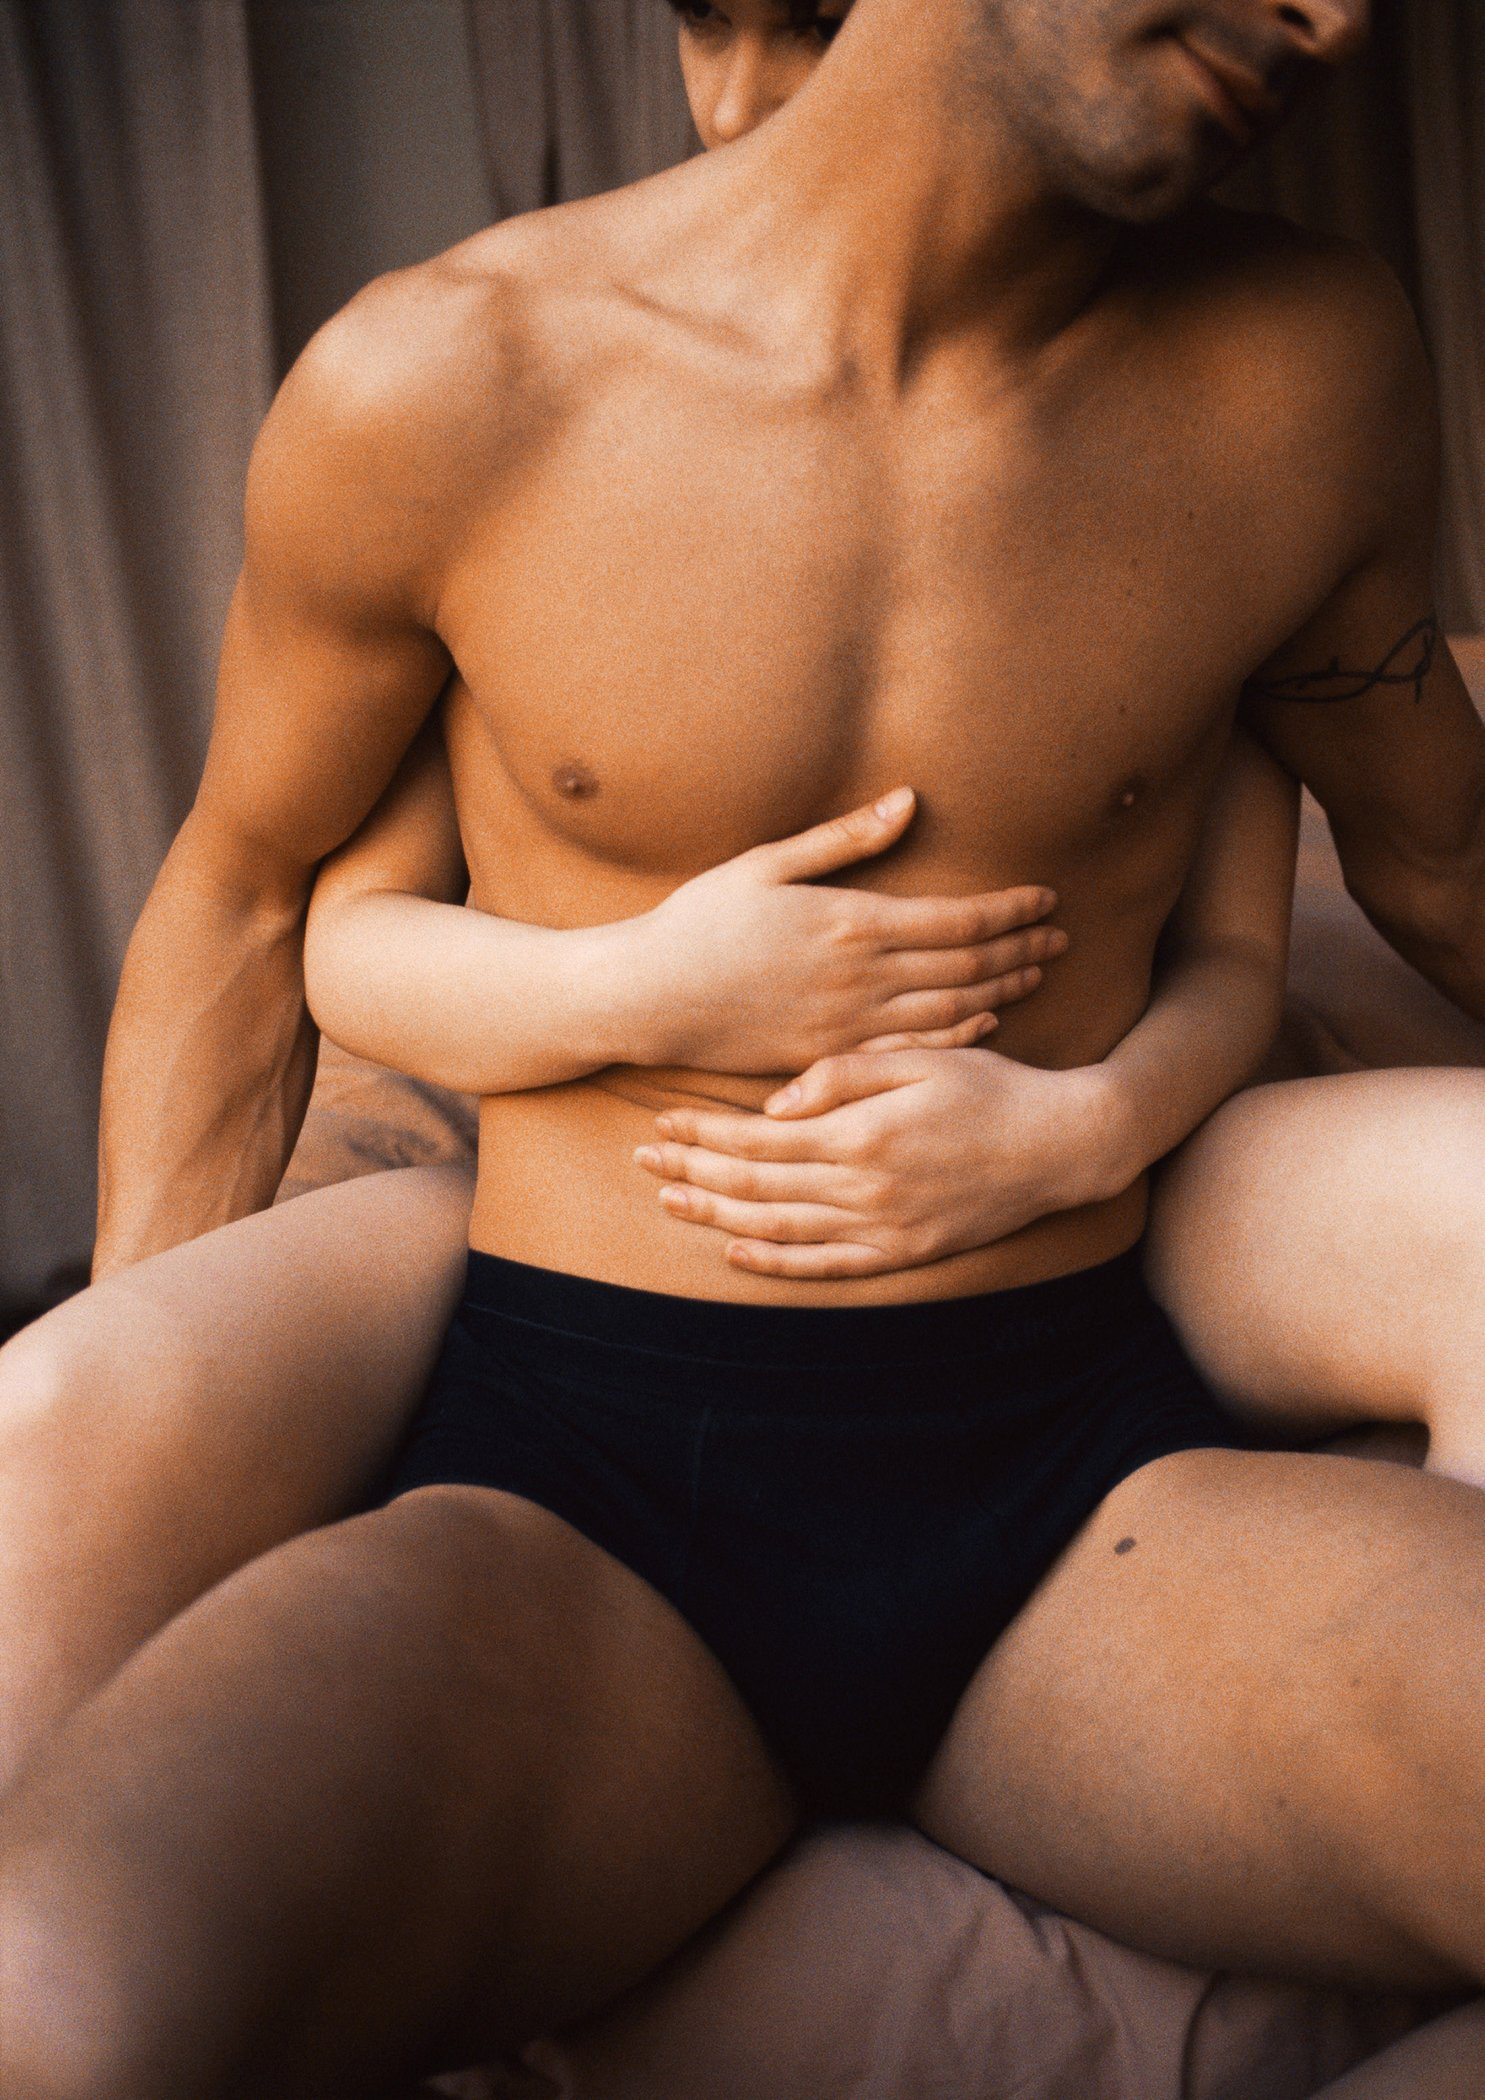 kvinders sexlyst biseksuelle kvinder